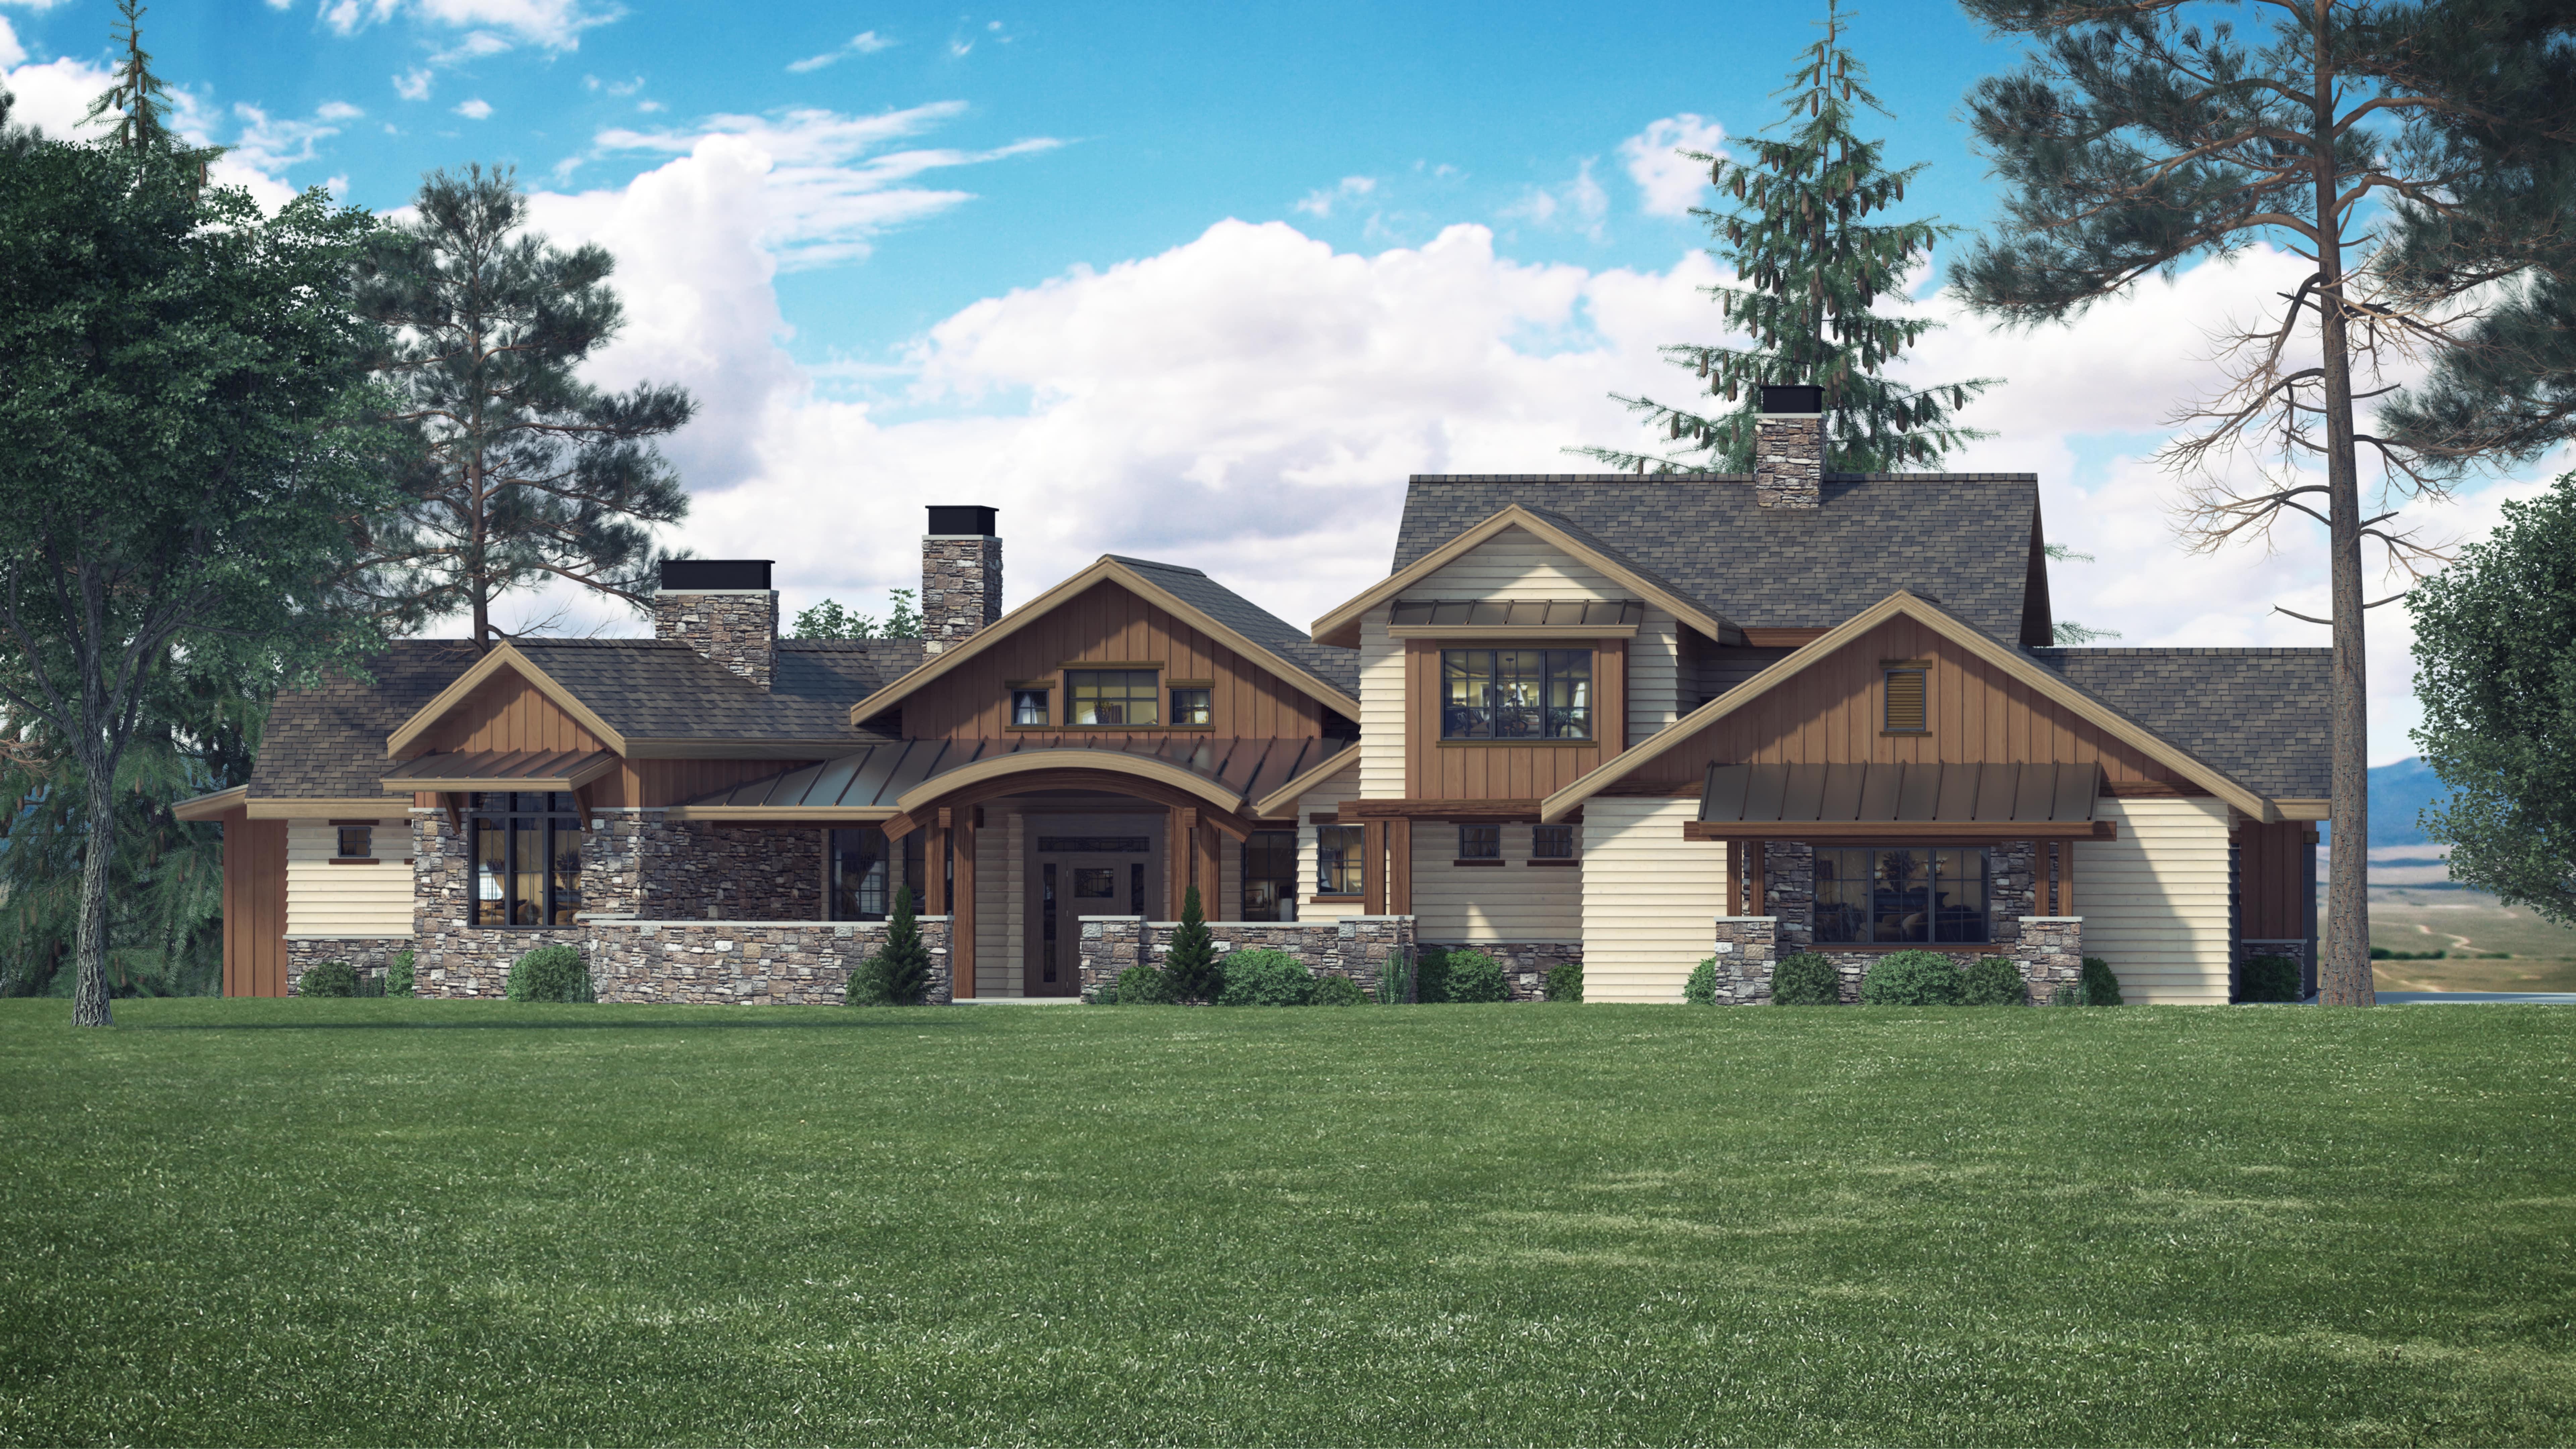 4 Bedrm 3998 Sq Ft Luxury House Plan 161 1066